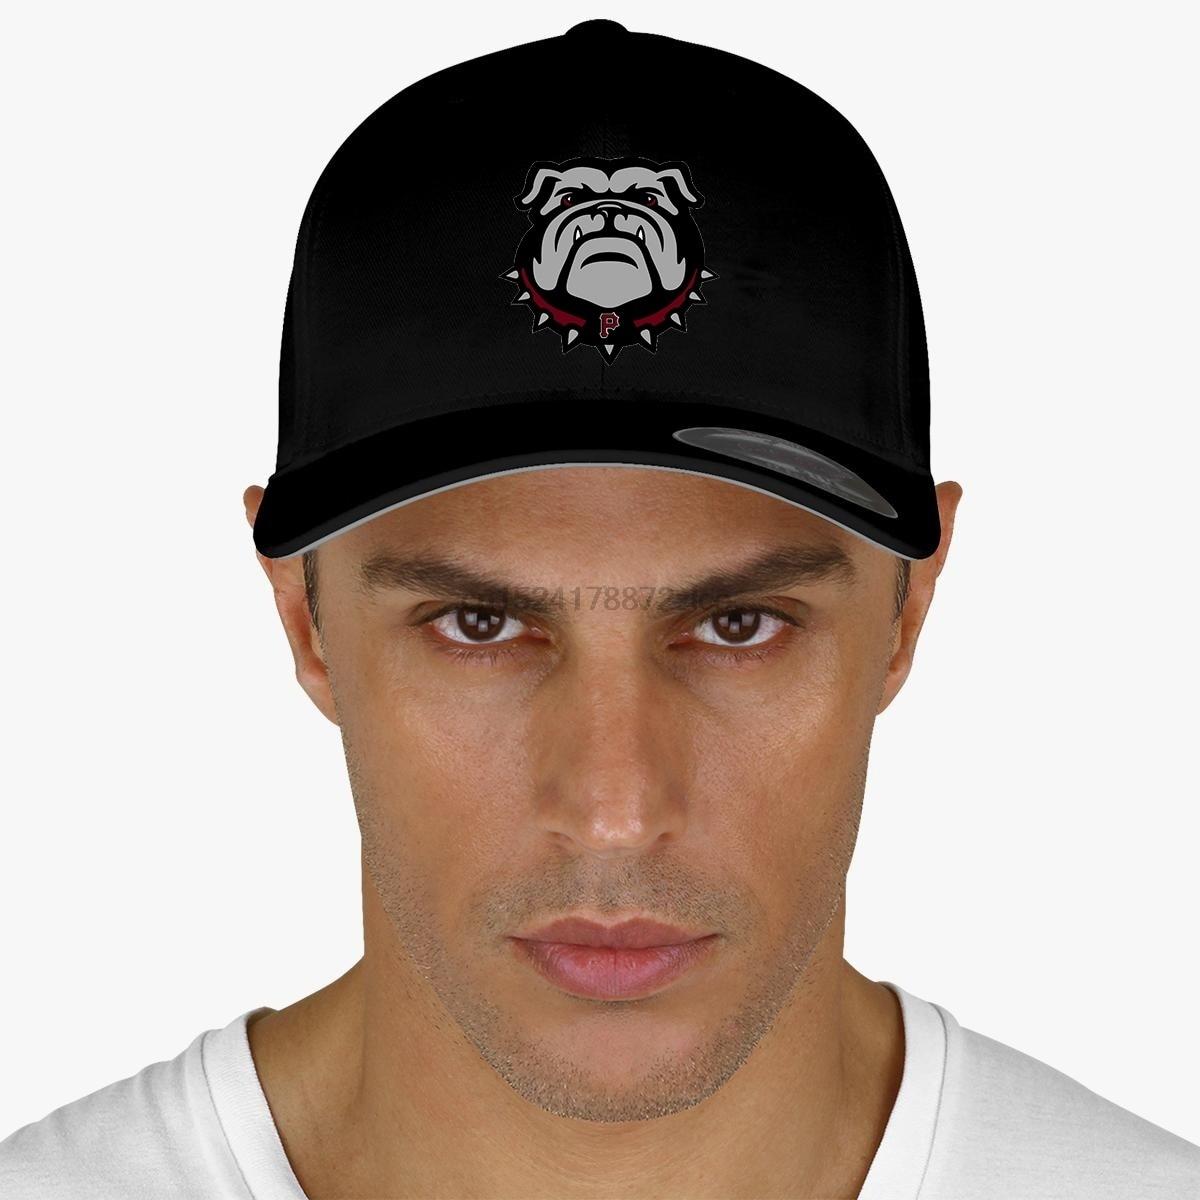 Fashion Classics Sport Hut Bulldog Logo Unisex Verstellbare Kappe 100% Garantie